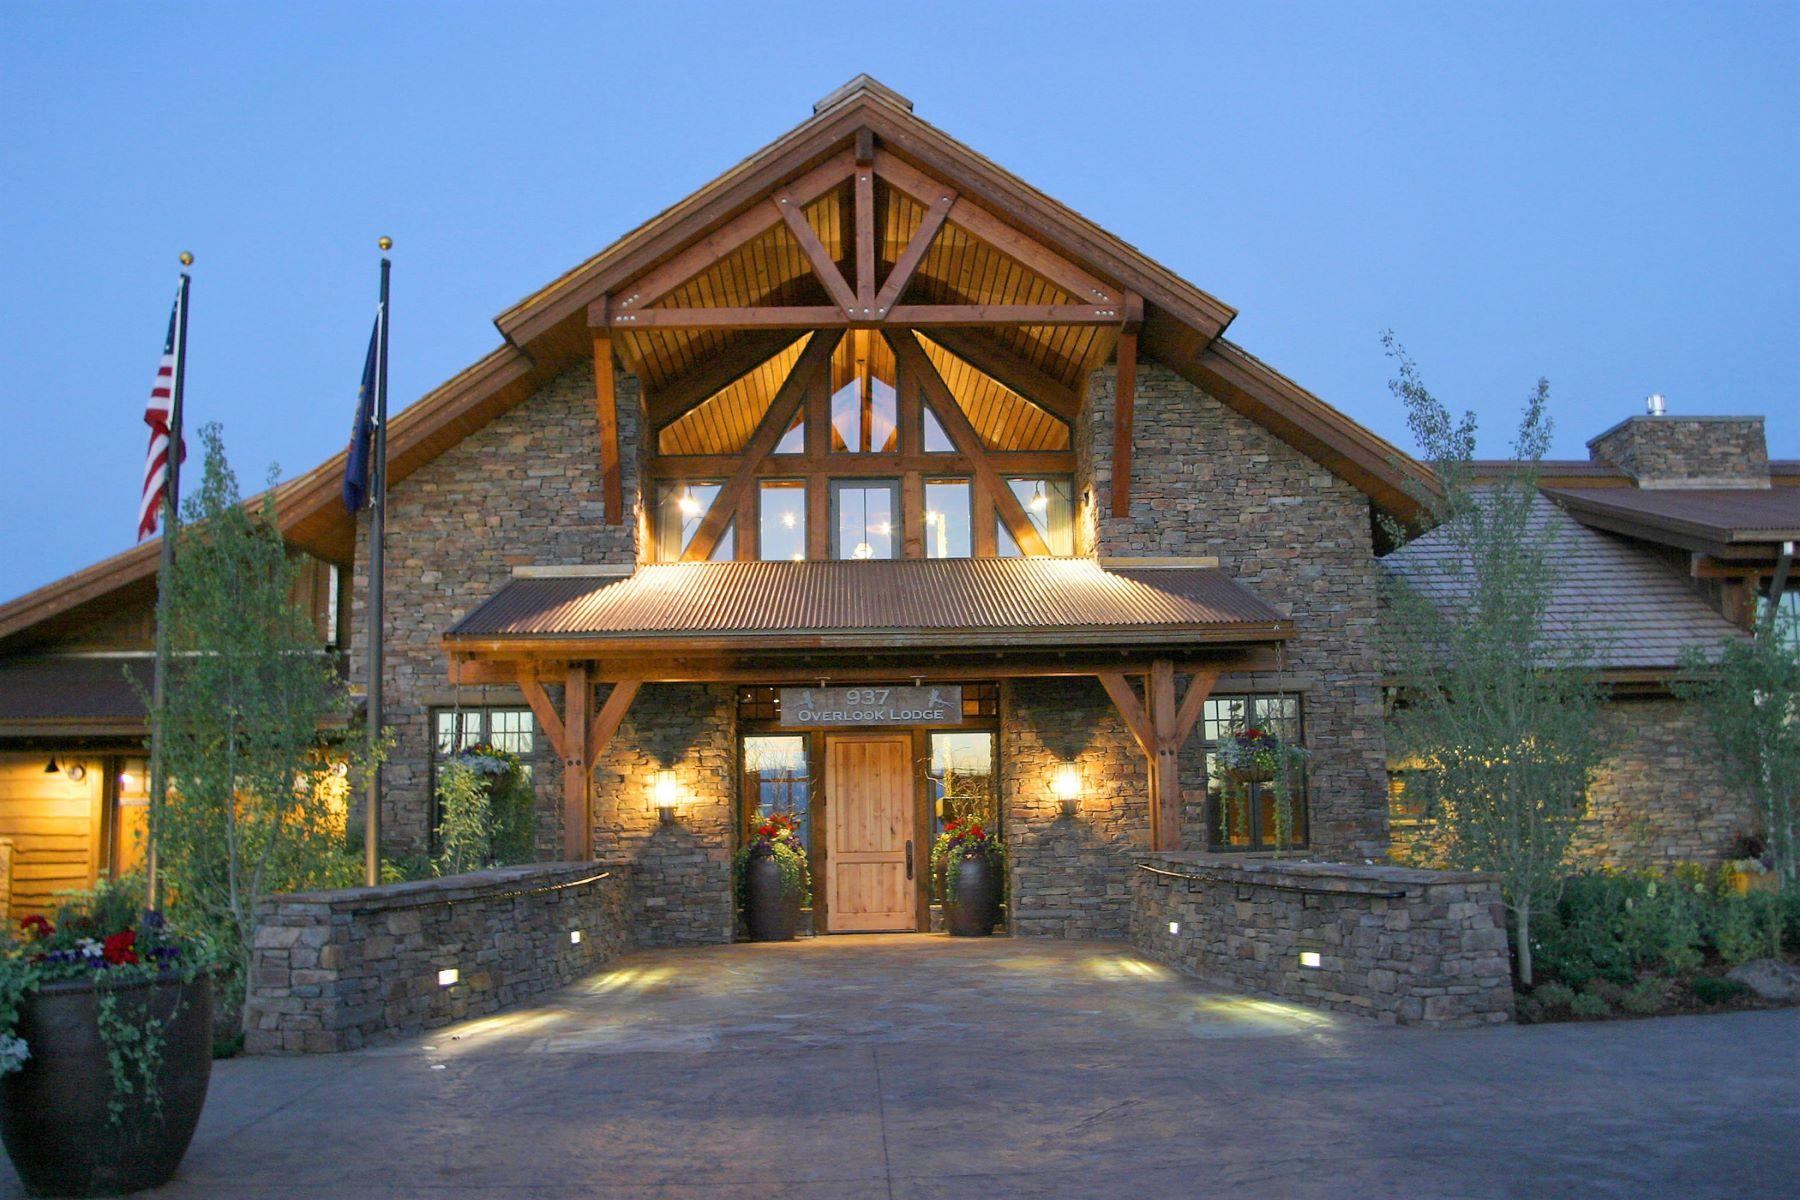 其它住宅 为 销售 在 River Rim Ranch Development Opportunity 8867 Rim Village Road 蒂托尼亚, 爱达荷州, 83452 Jackson Hole, 美国